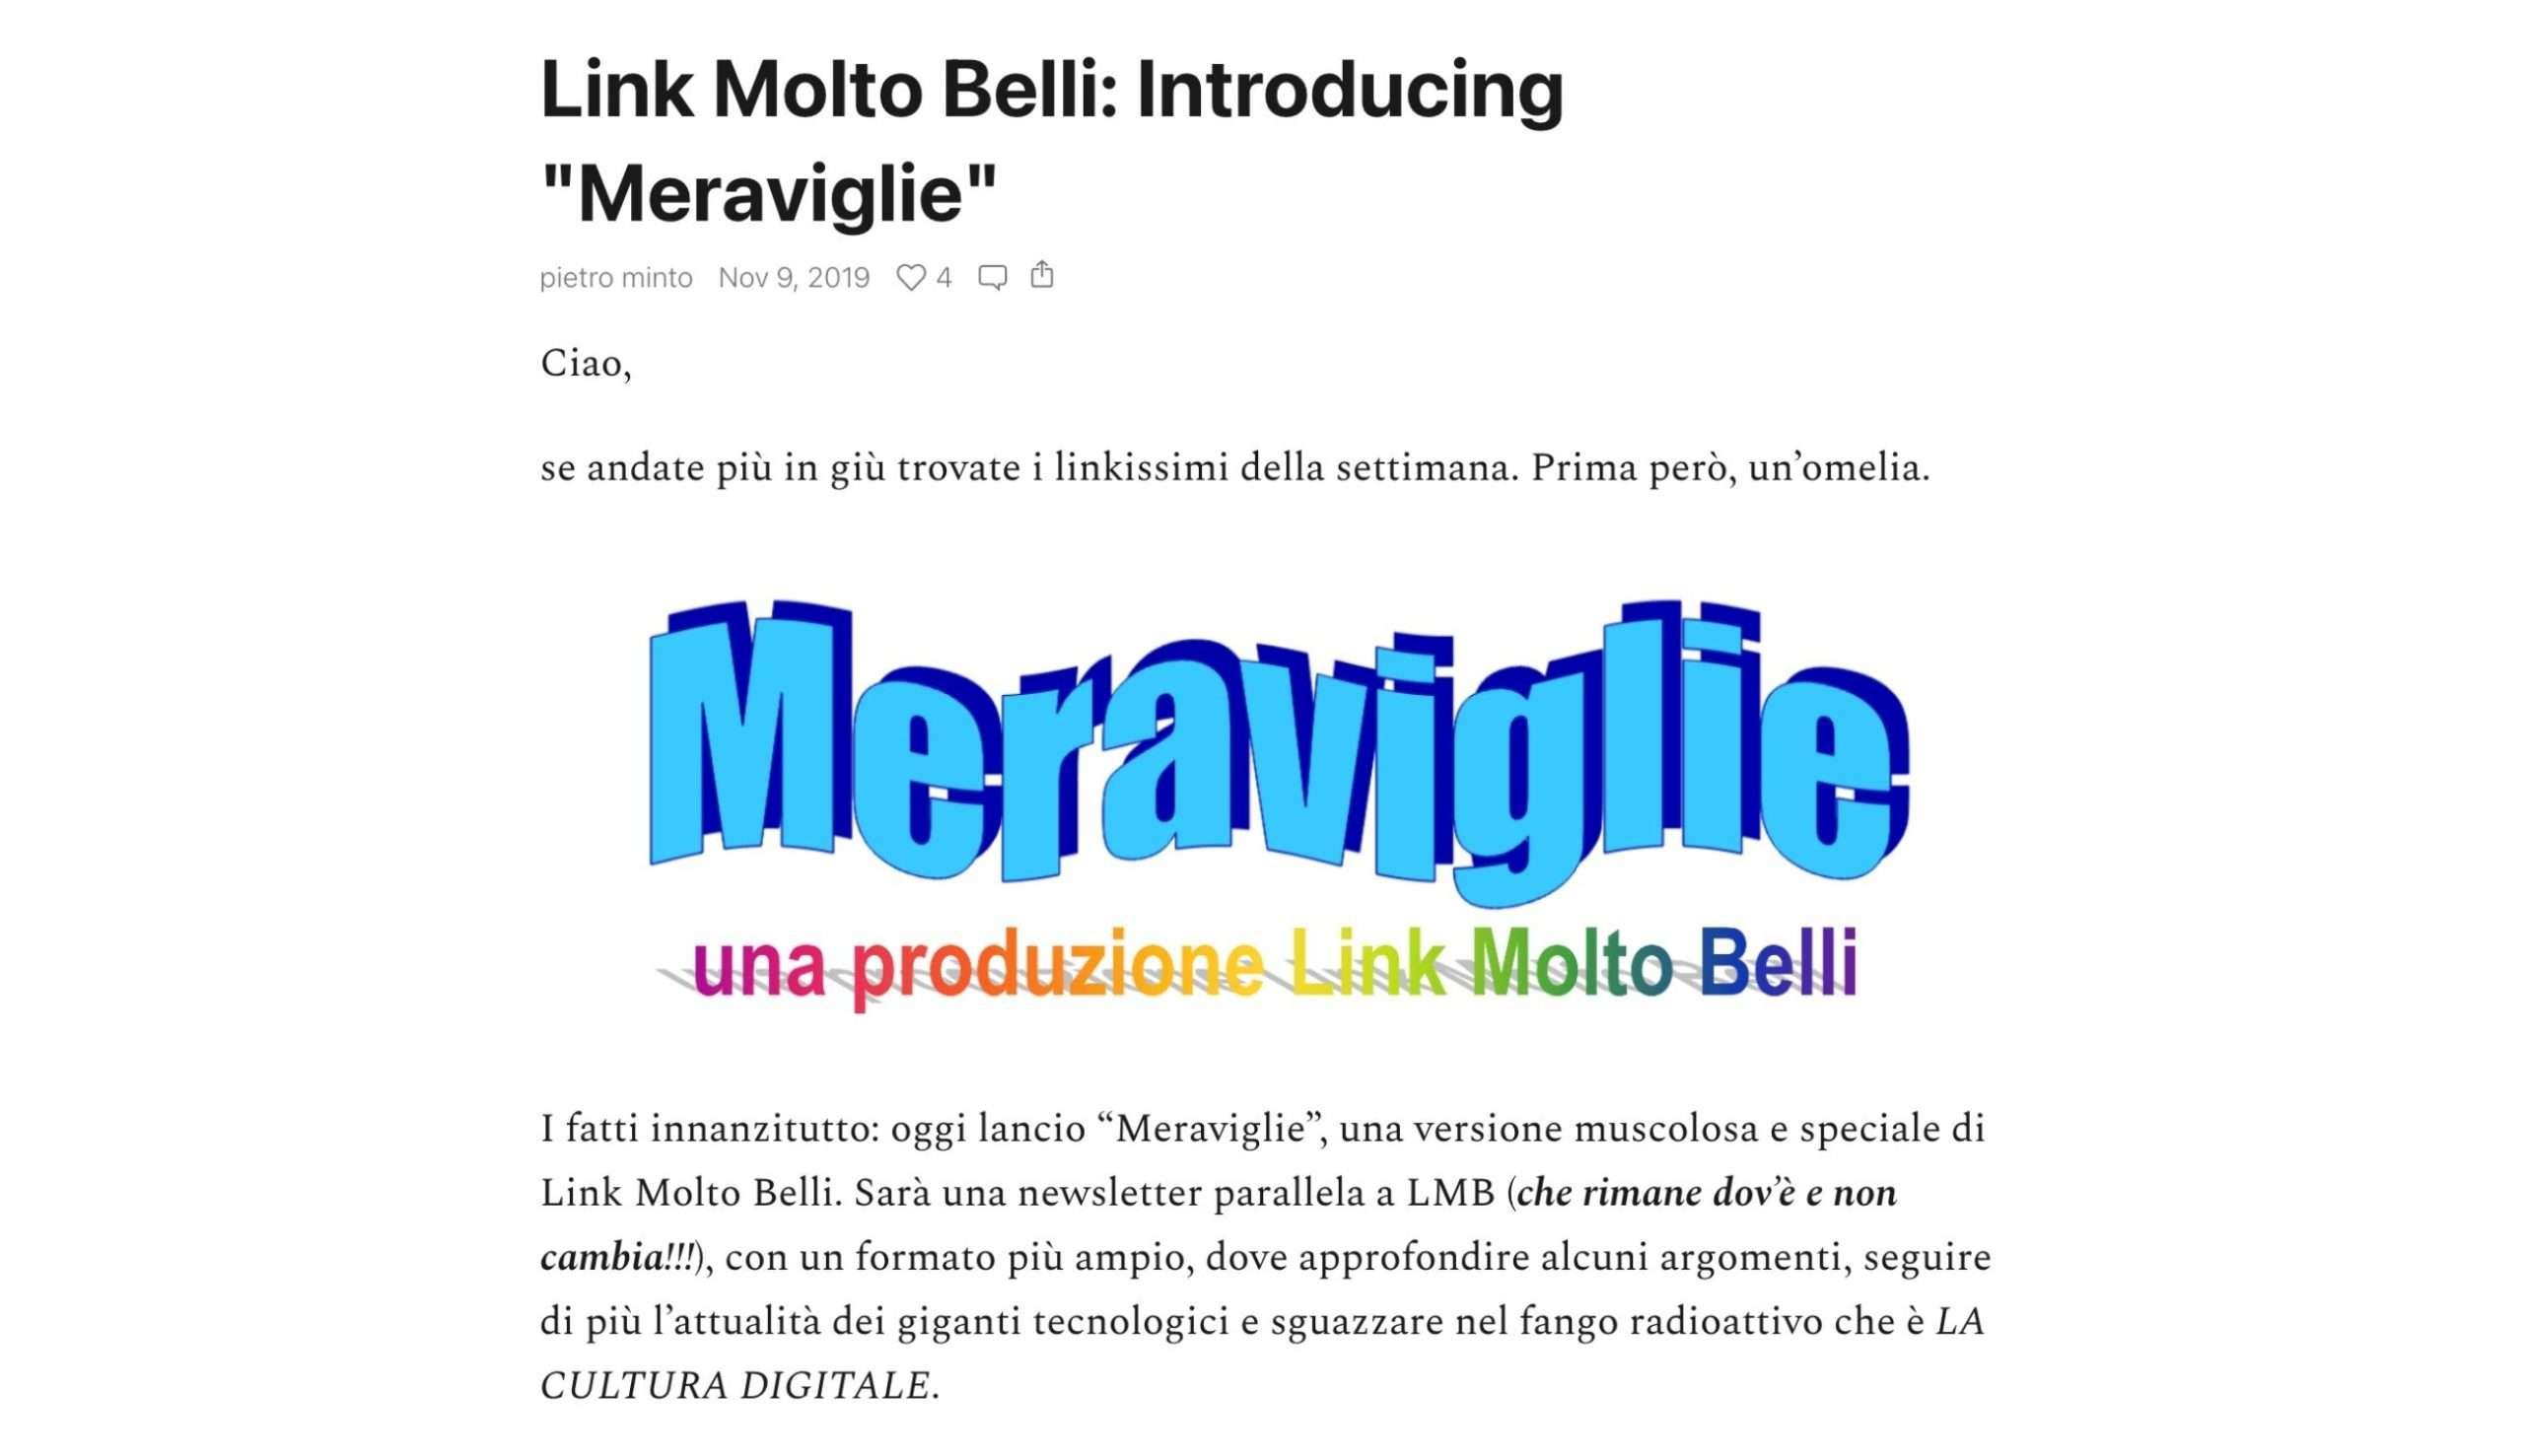 Meraviglie - Pietro Minto